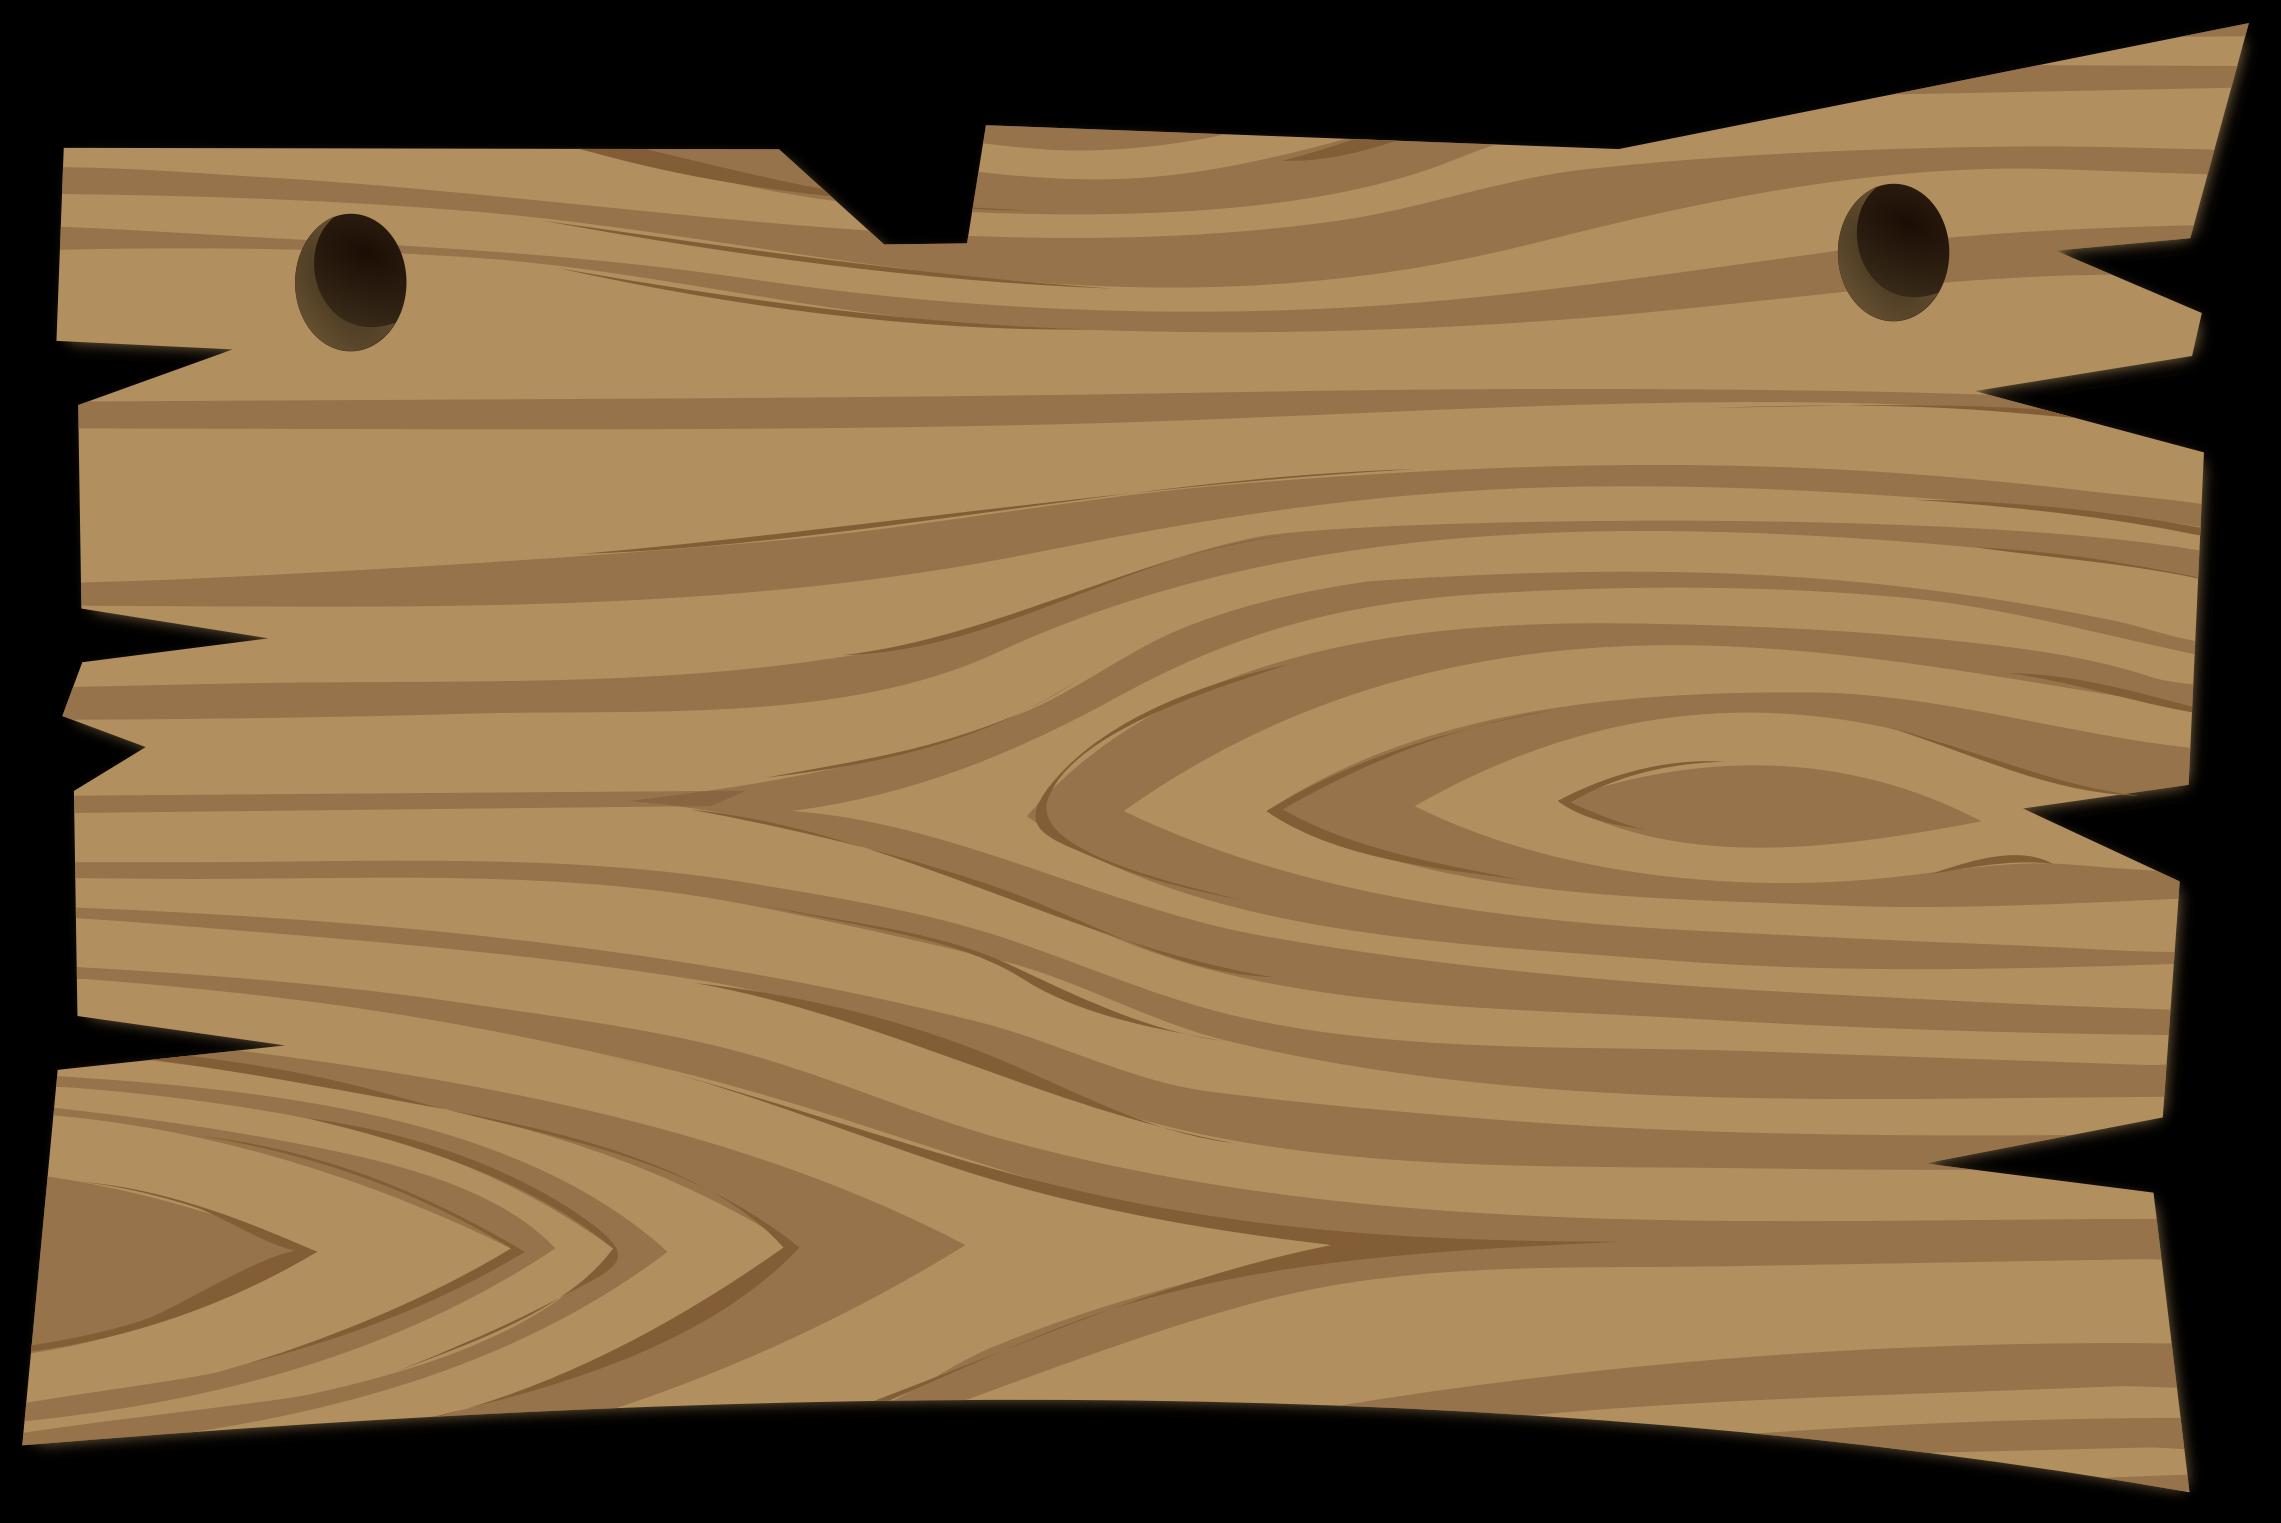 2281x1523 Sign Clipart Rustic Wood